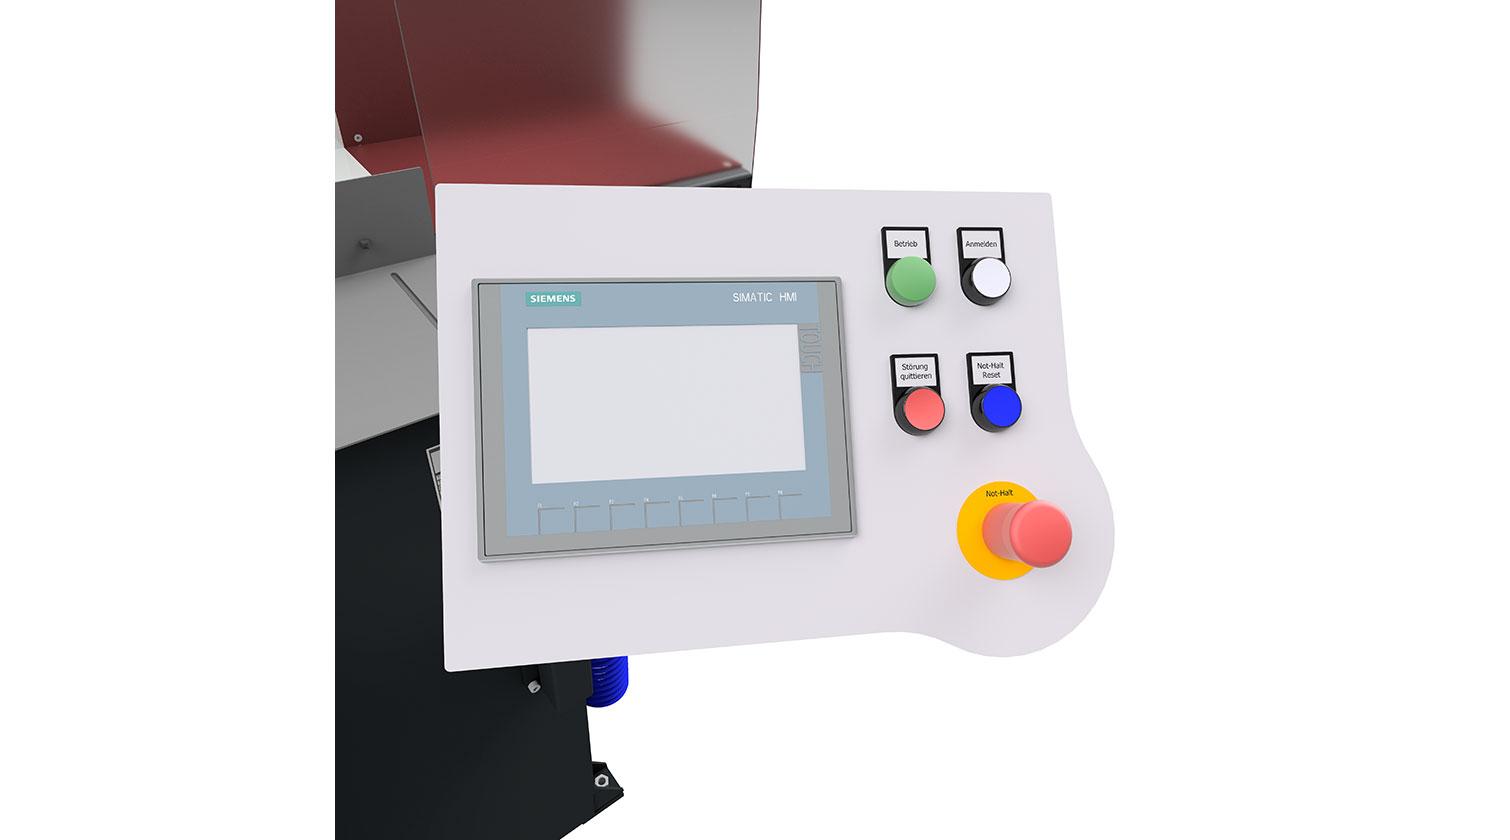 INT aluminum automatic saw Pressta Eisele Profilma 502 operator interface